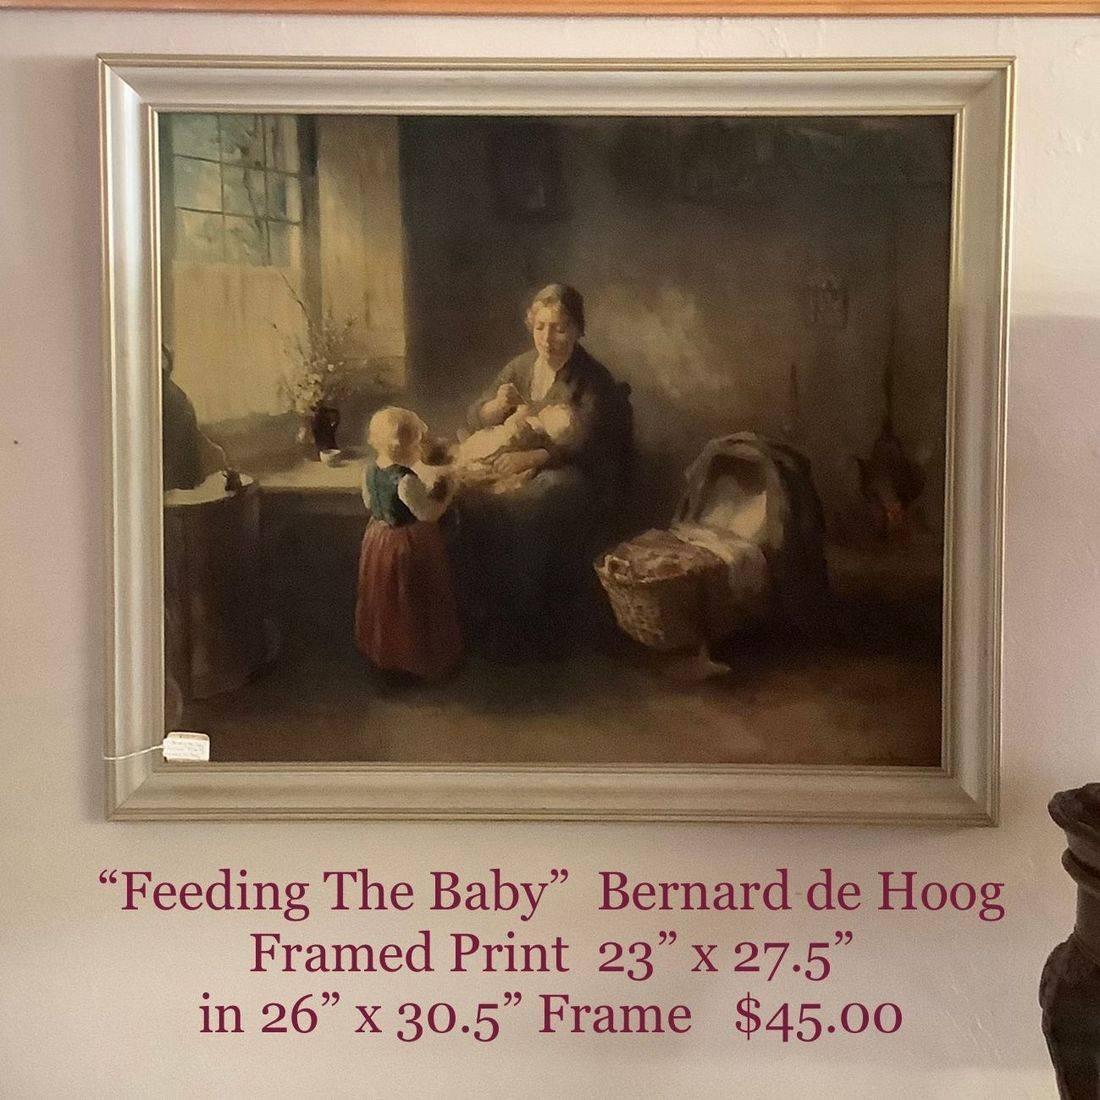 """Feeding the Baby"" Framed Print by Bernard de Hoog  $45.00"